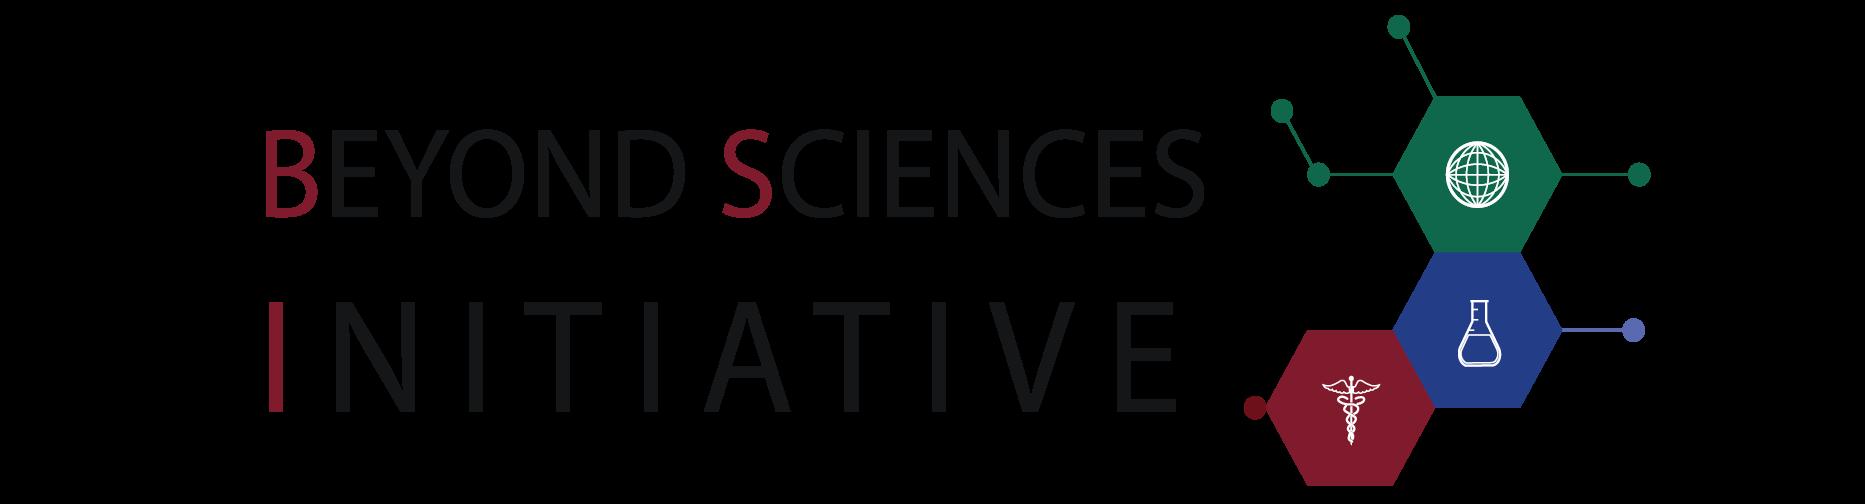 Beyond Sciences Logo